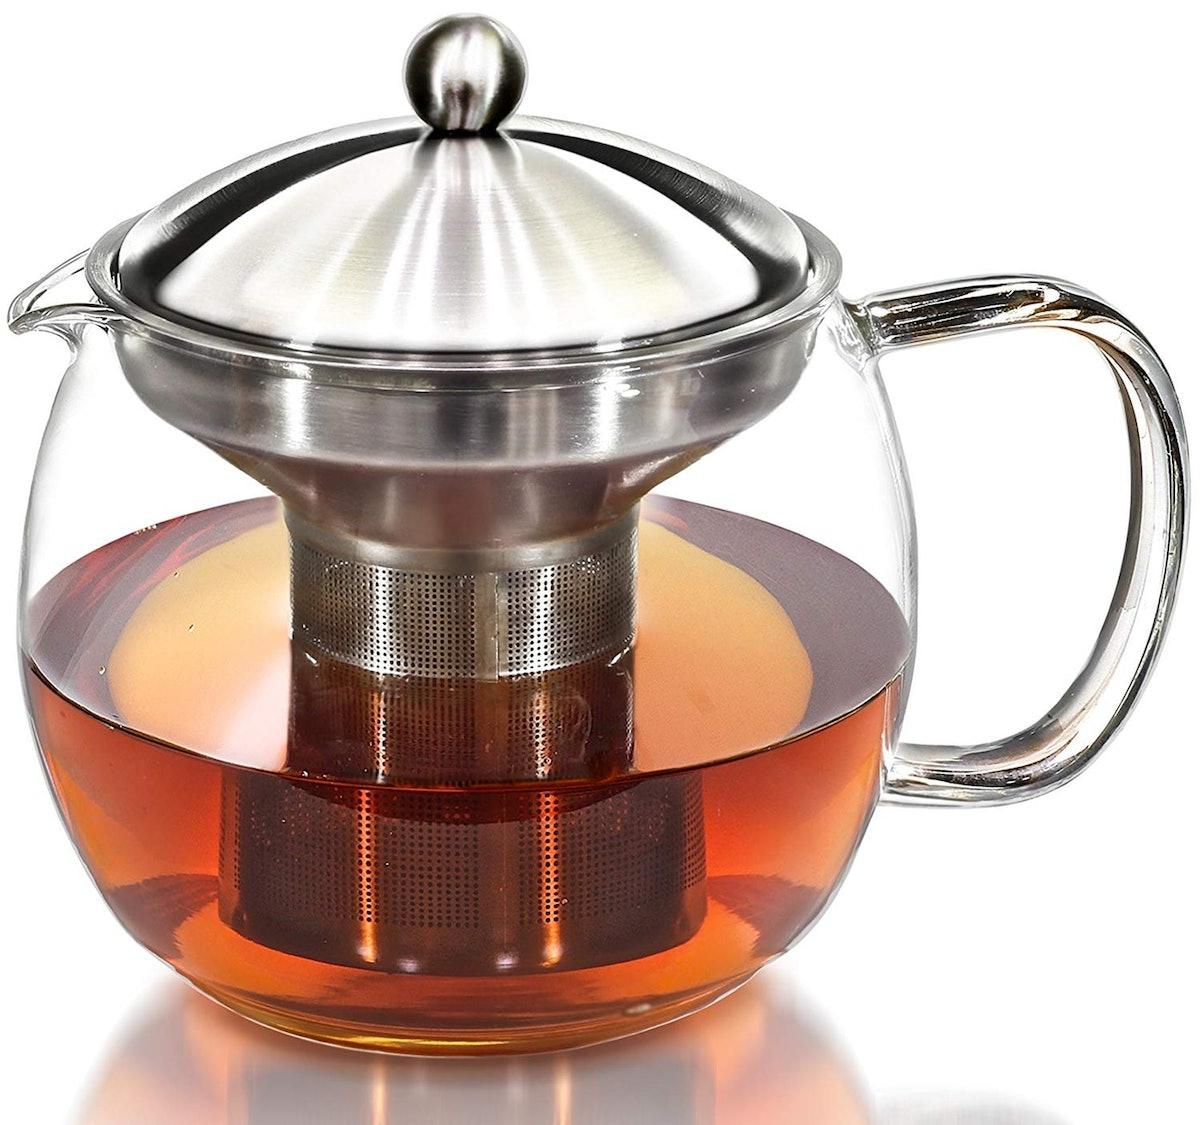 Willow & Everett Teapot Kettle